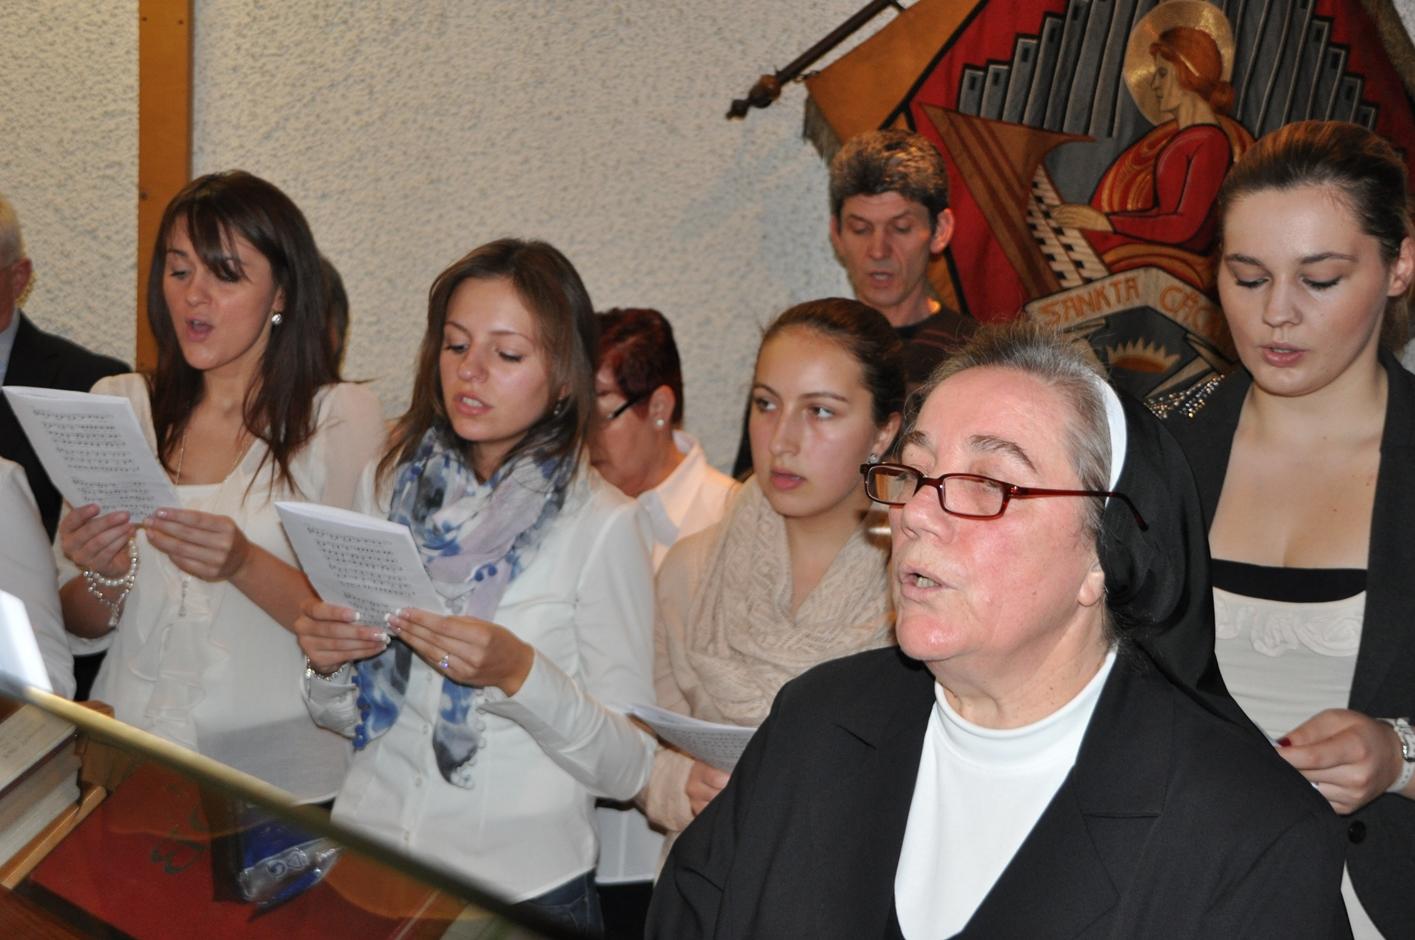 primopredaja frajos franed (9)